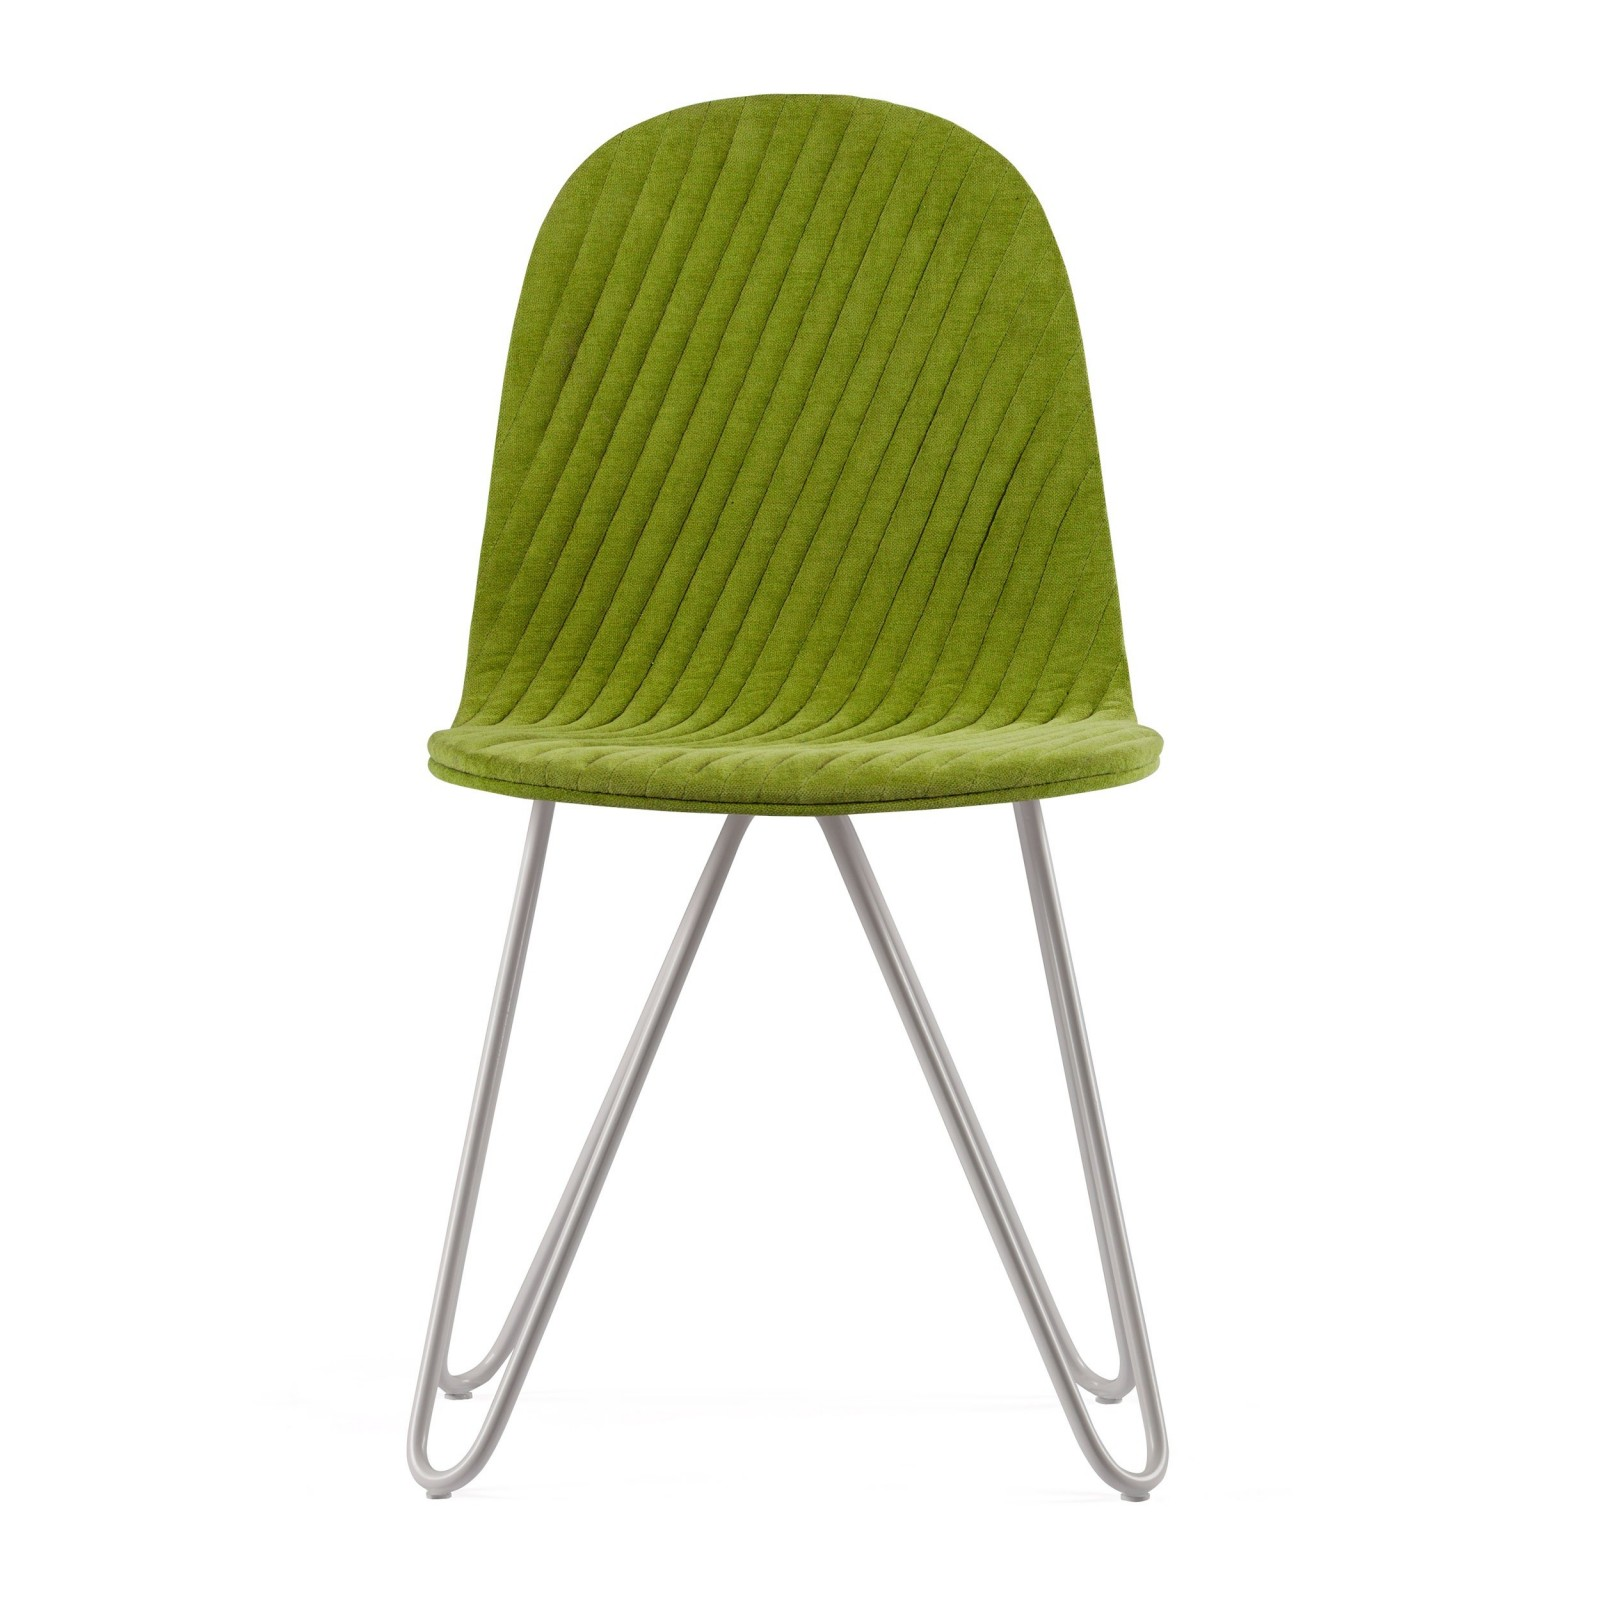 Mannequin chair - 03 - green